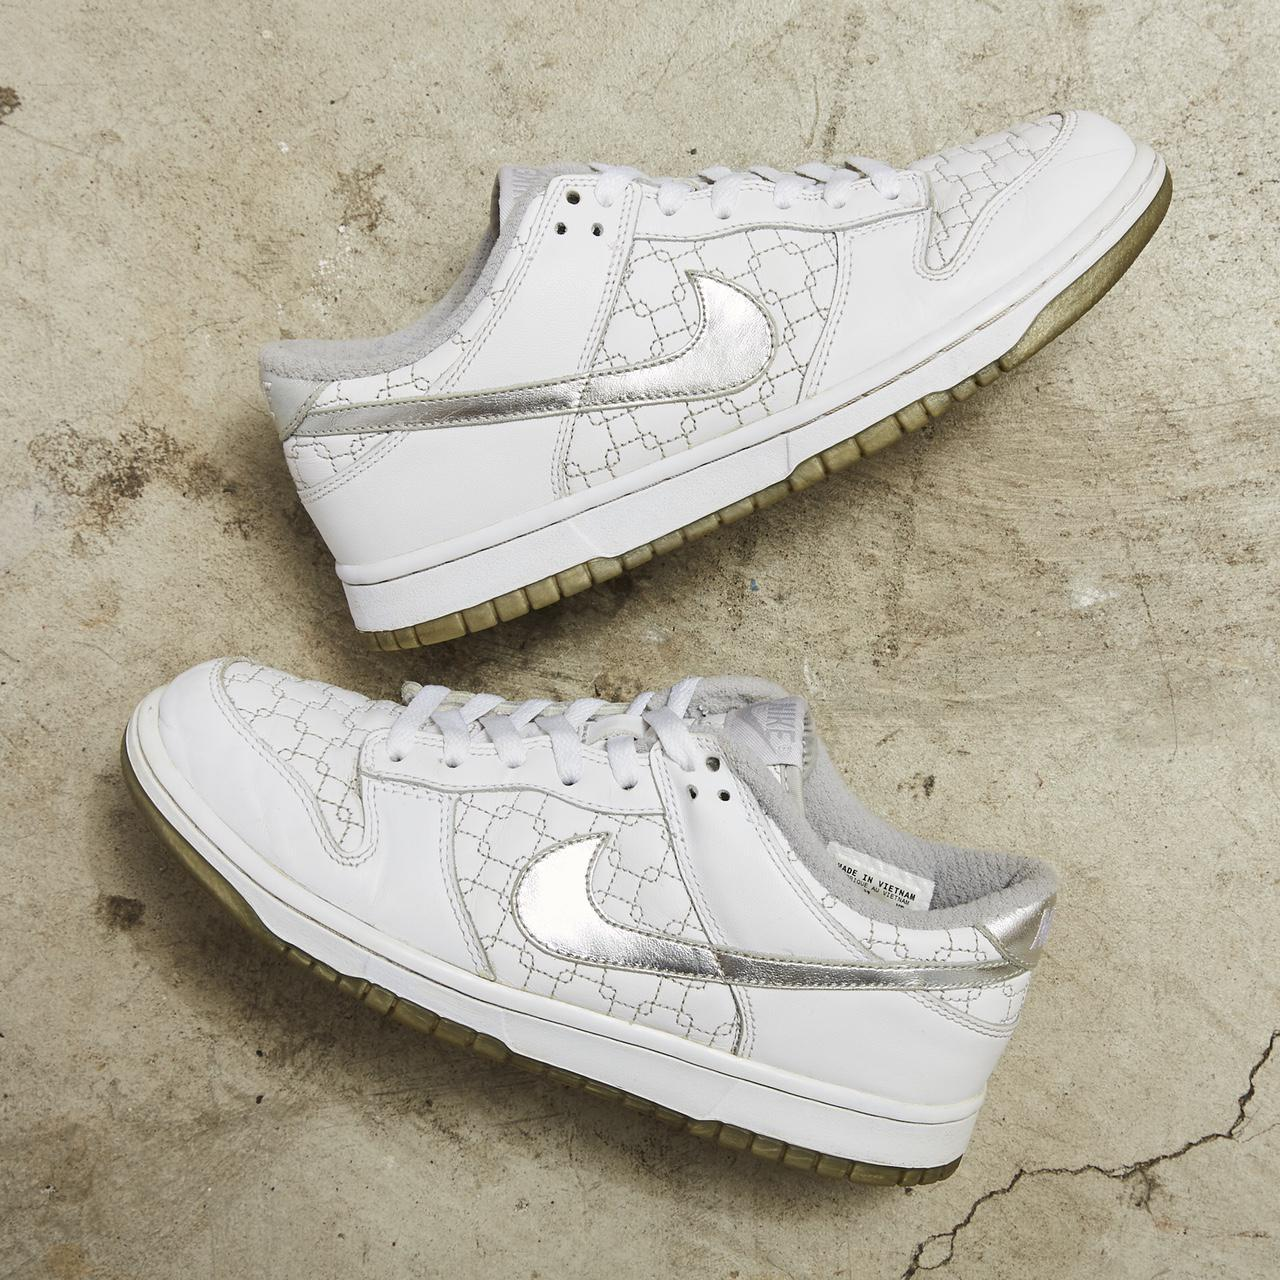 Product Image 1 - Nike Dunk Low 'White/Metallic Silver/Max